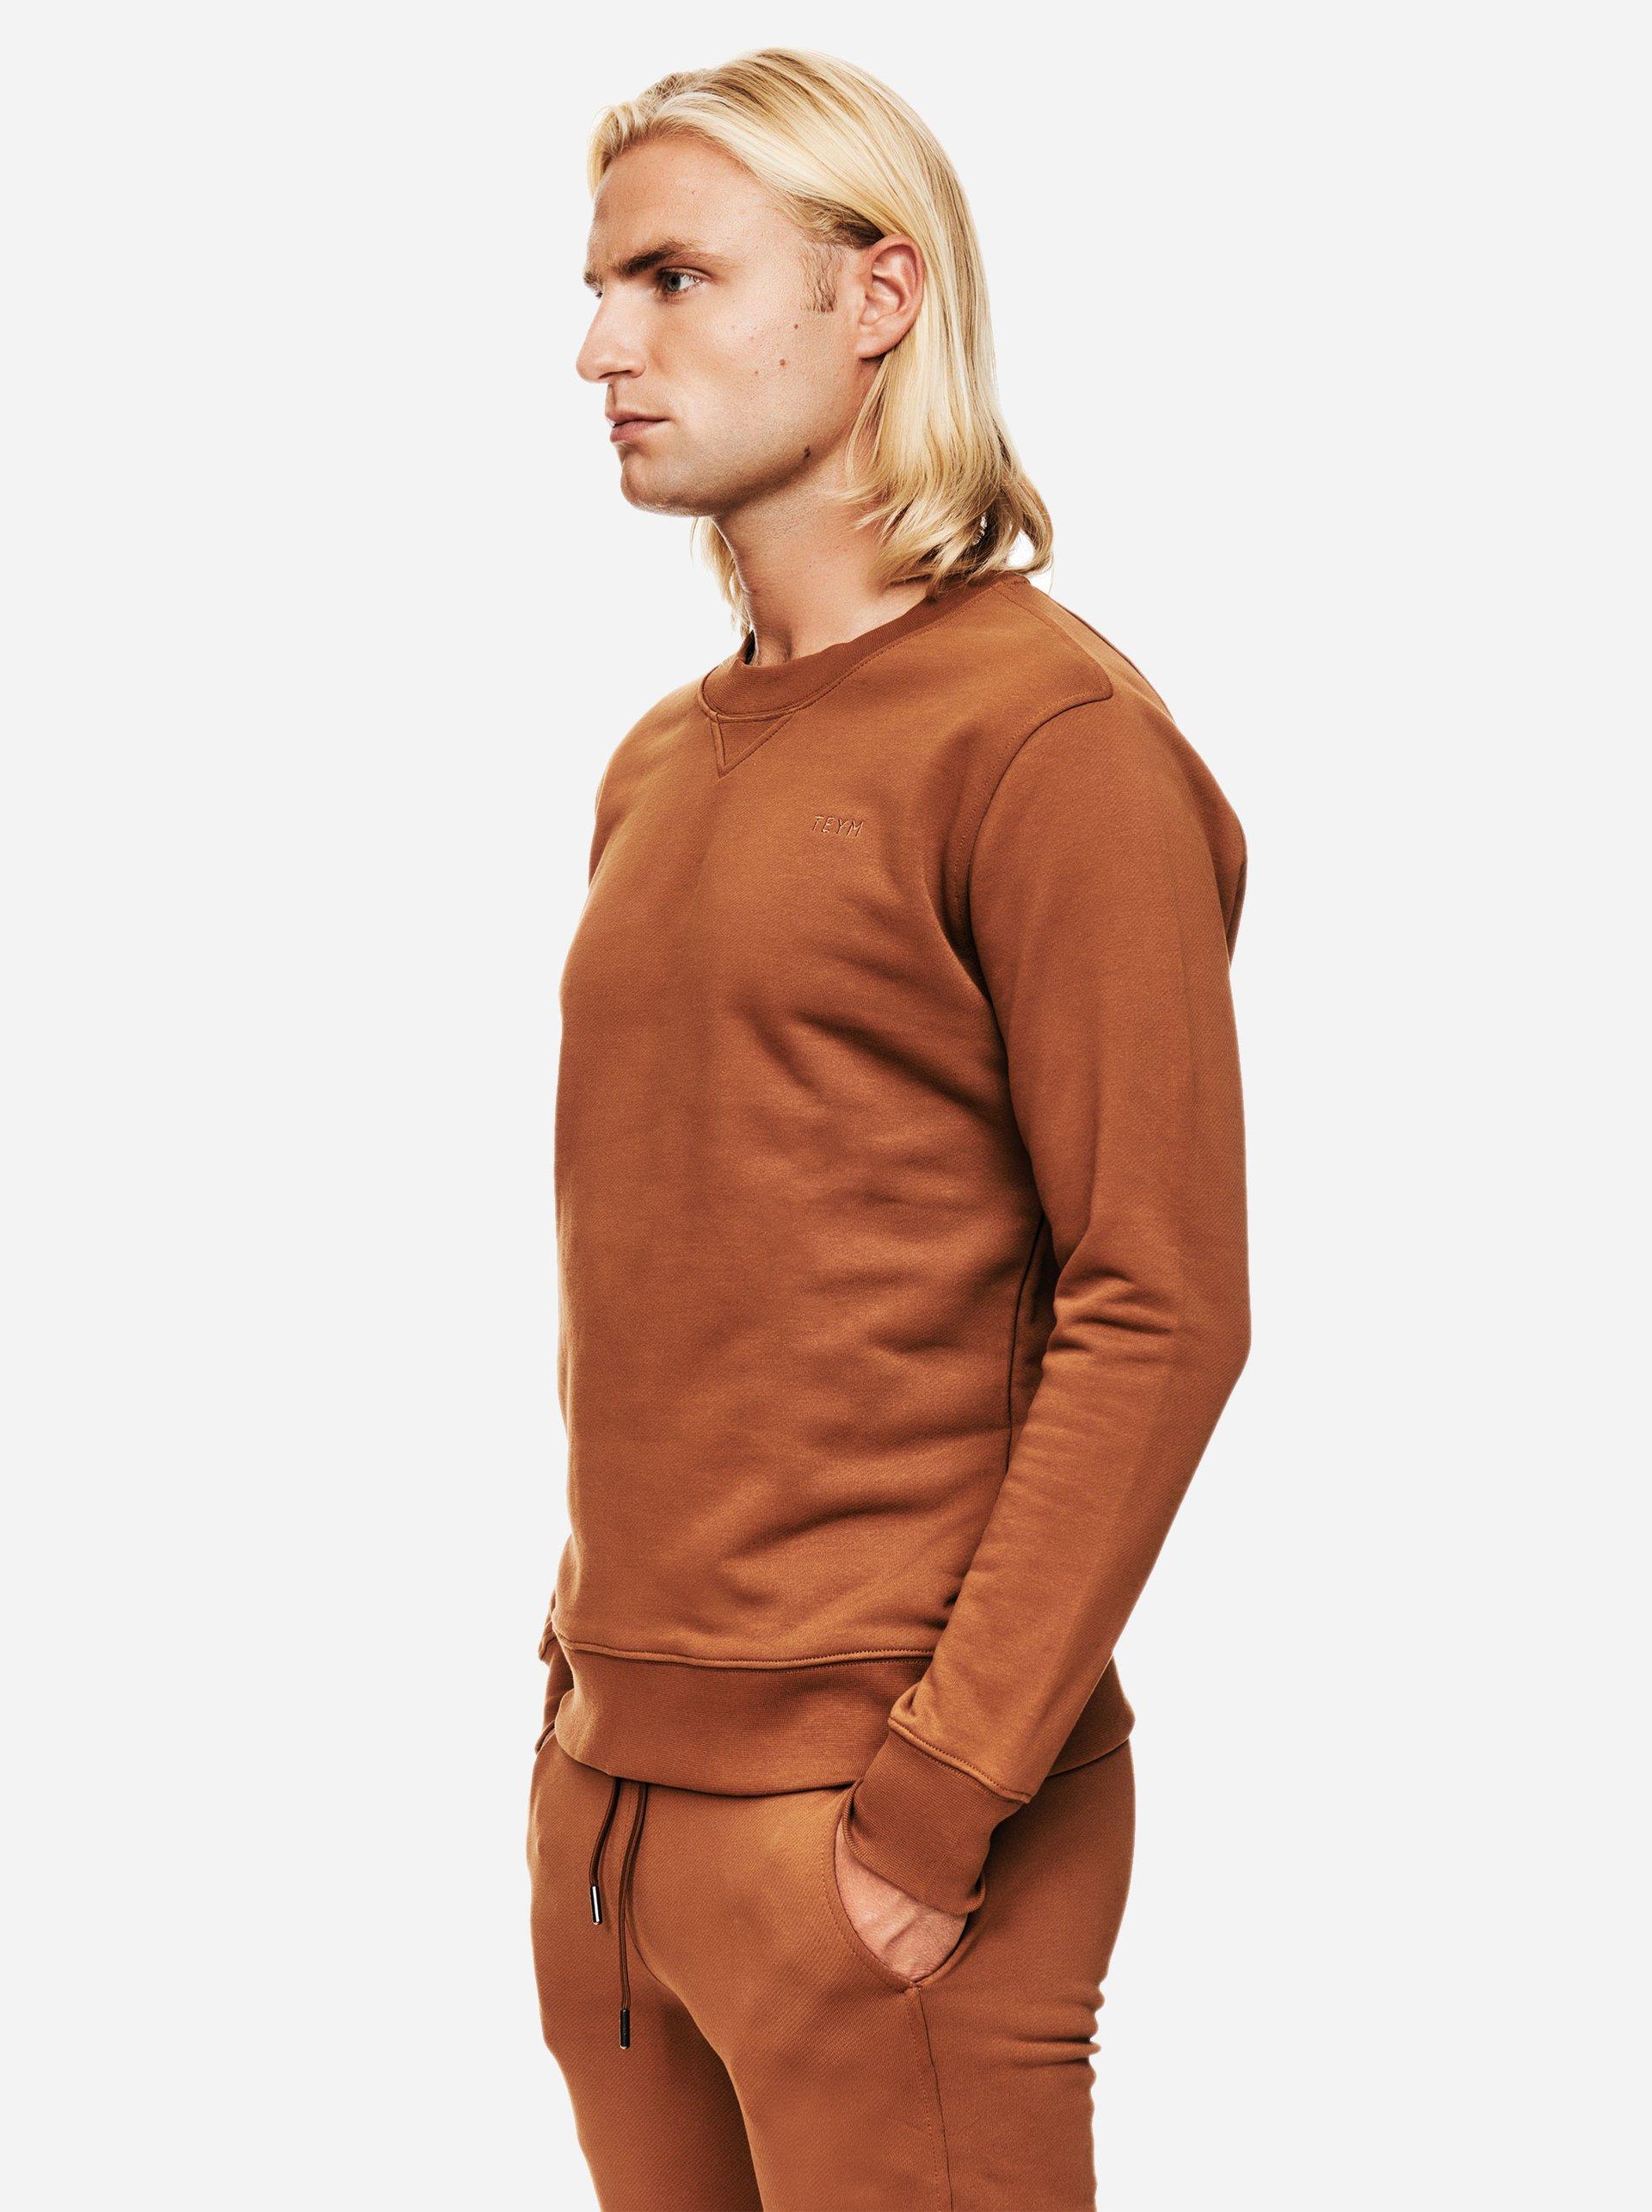 Teym-TheSweatshirt-Men-Camel03